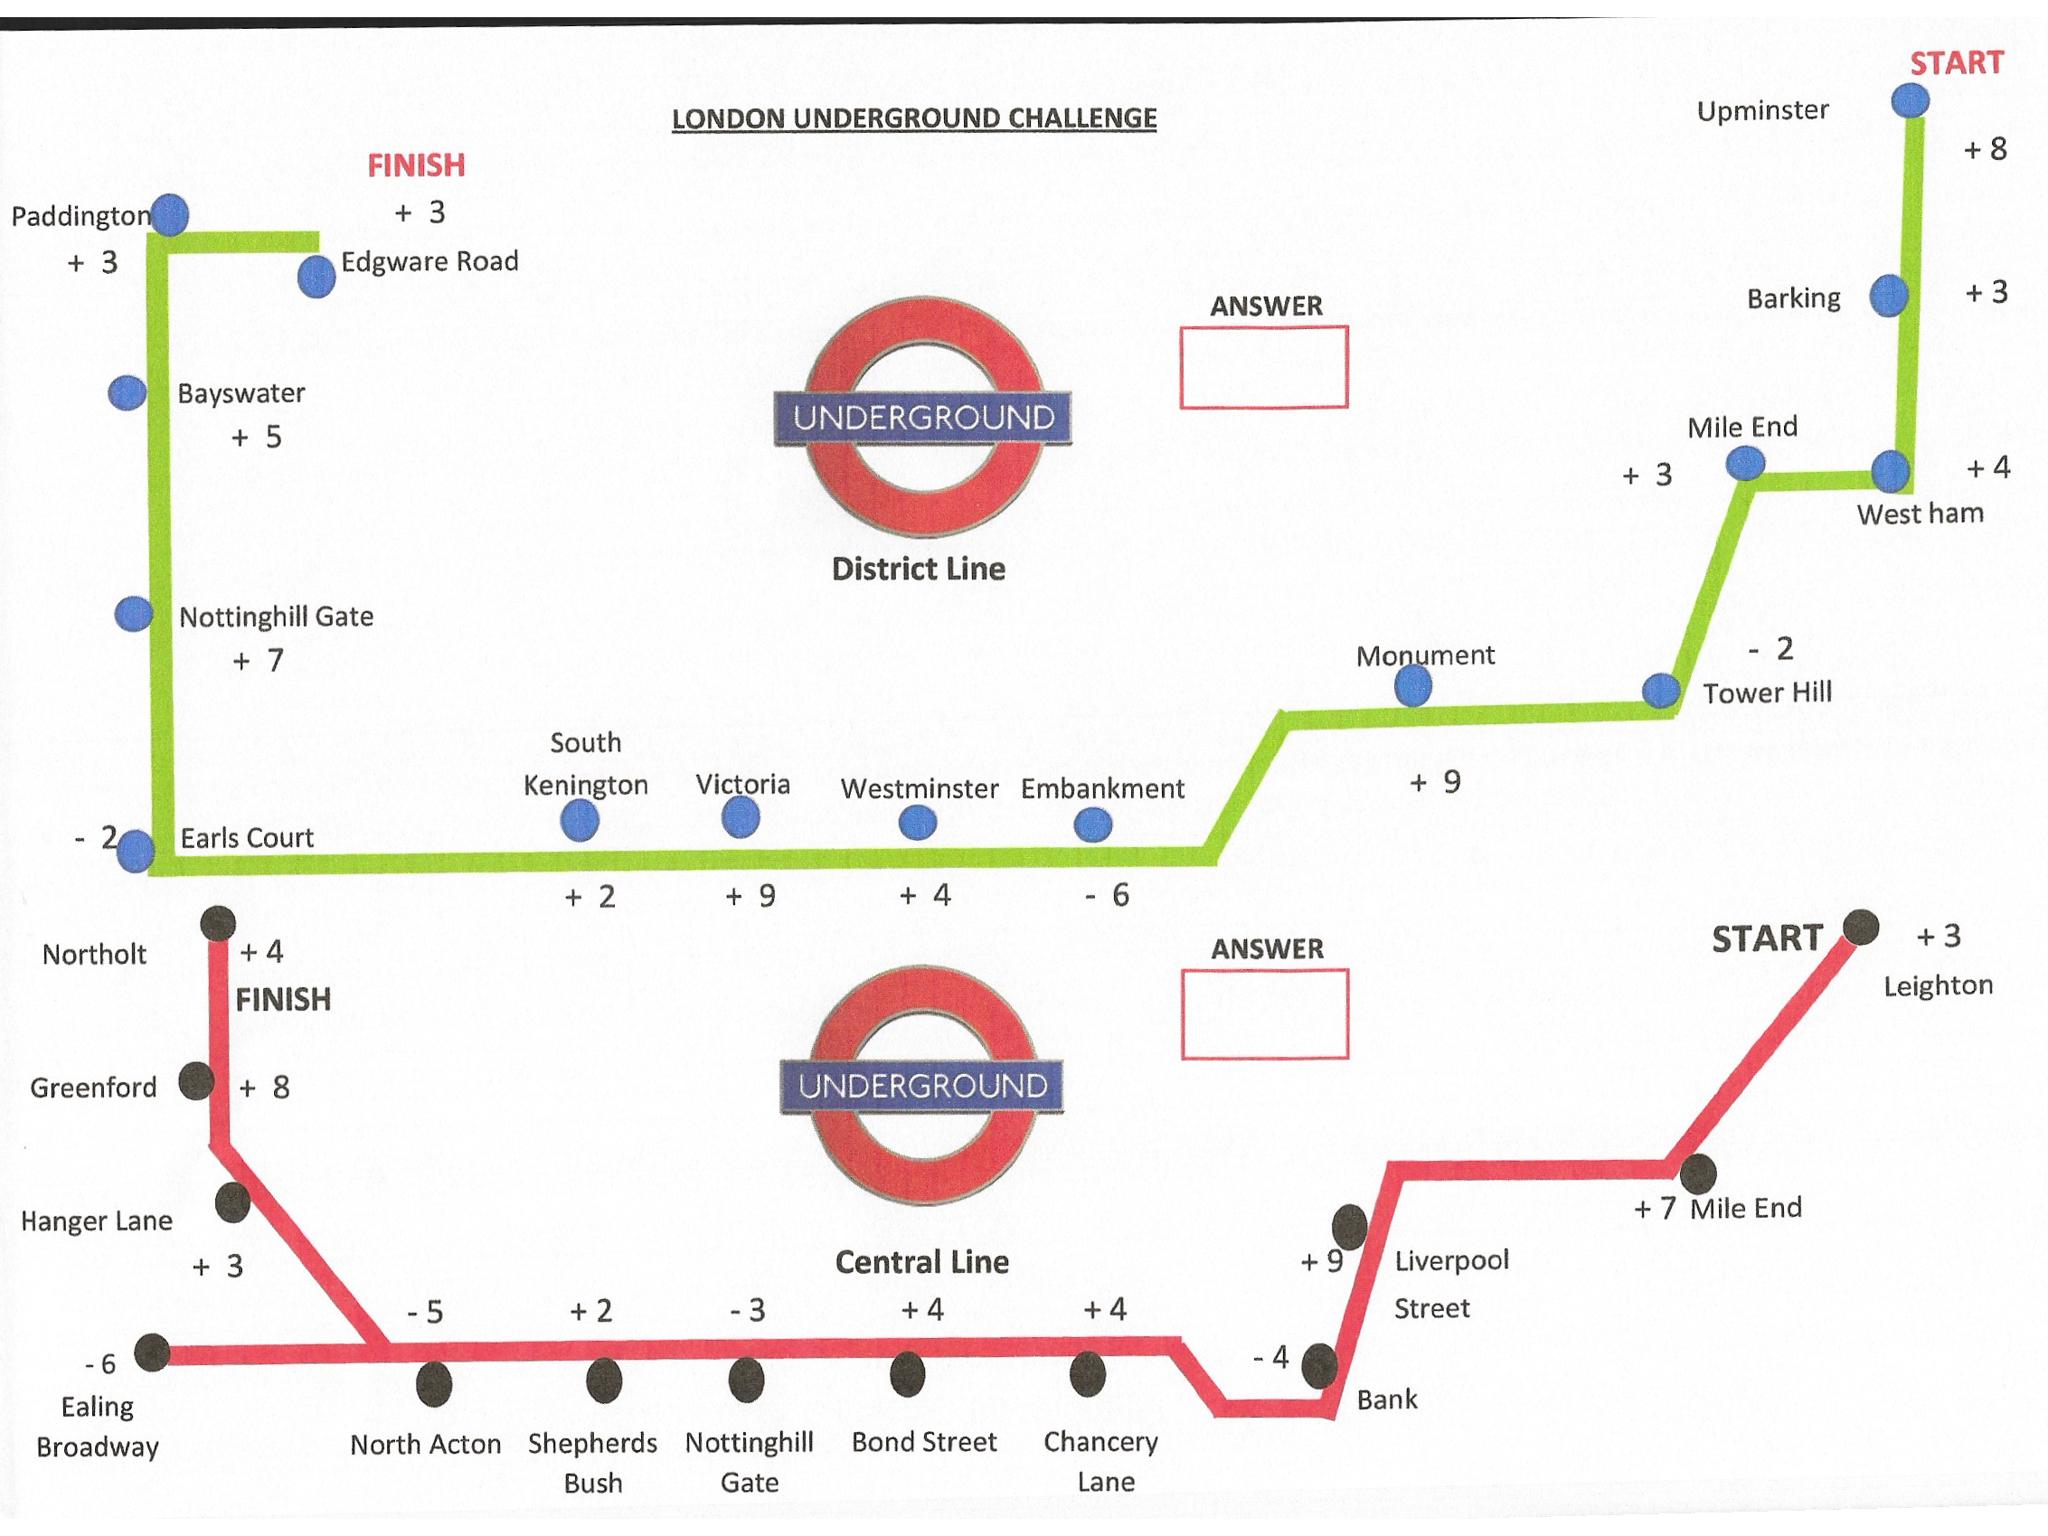 KS1 London Underground Adventure